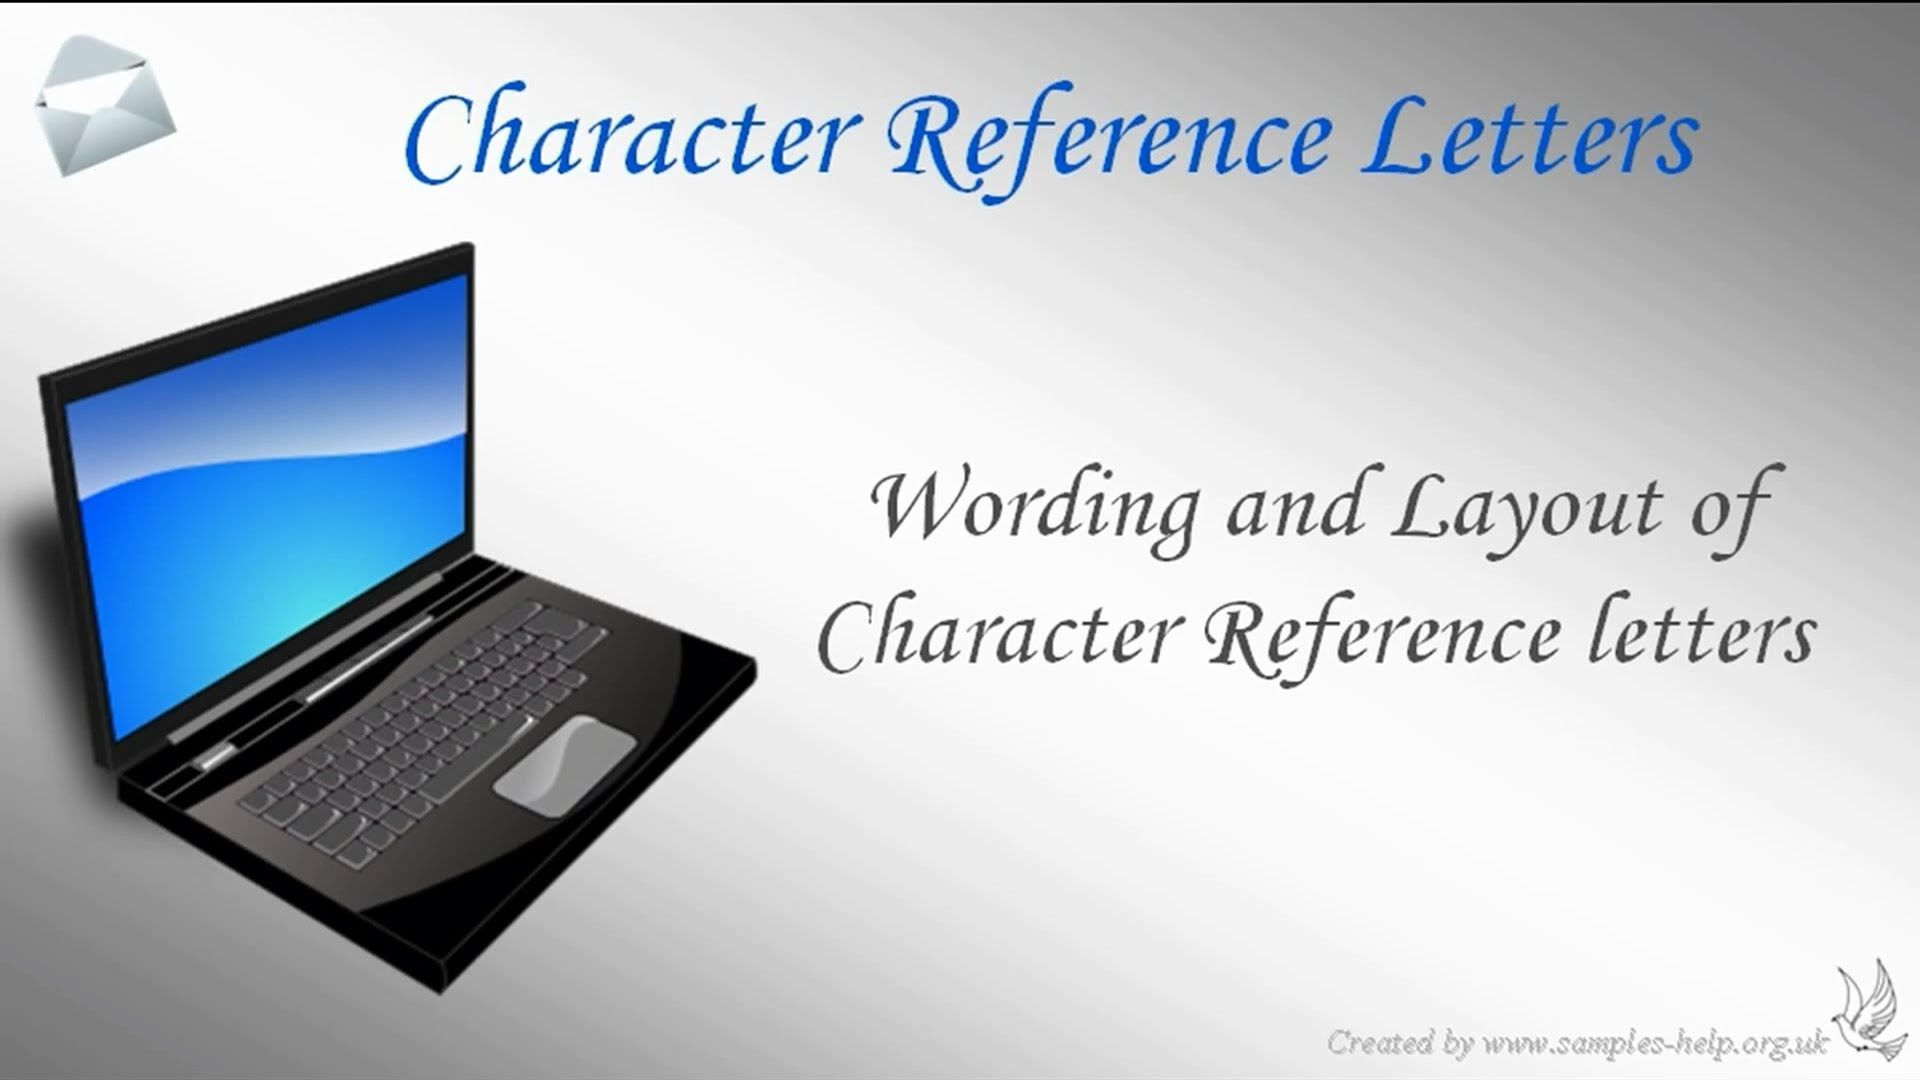 httpsampleshelporguksampleletterscharacterreference – How to Write a Reference Letter Uk